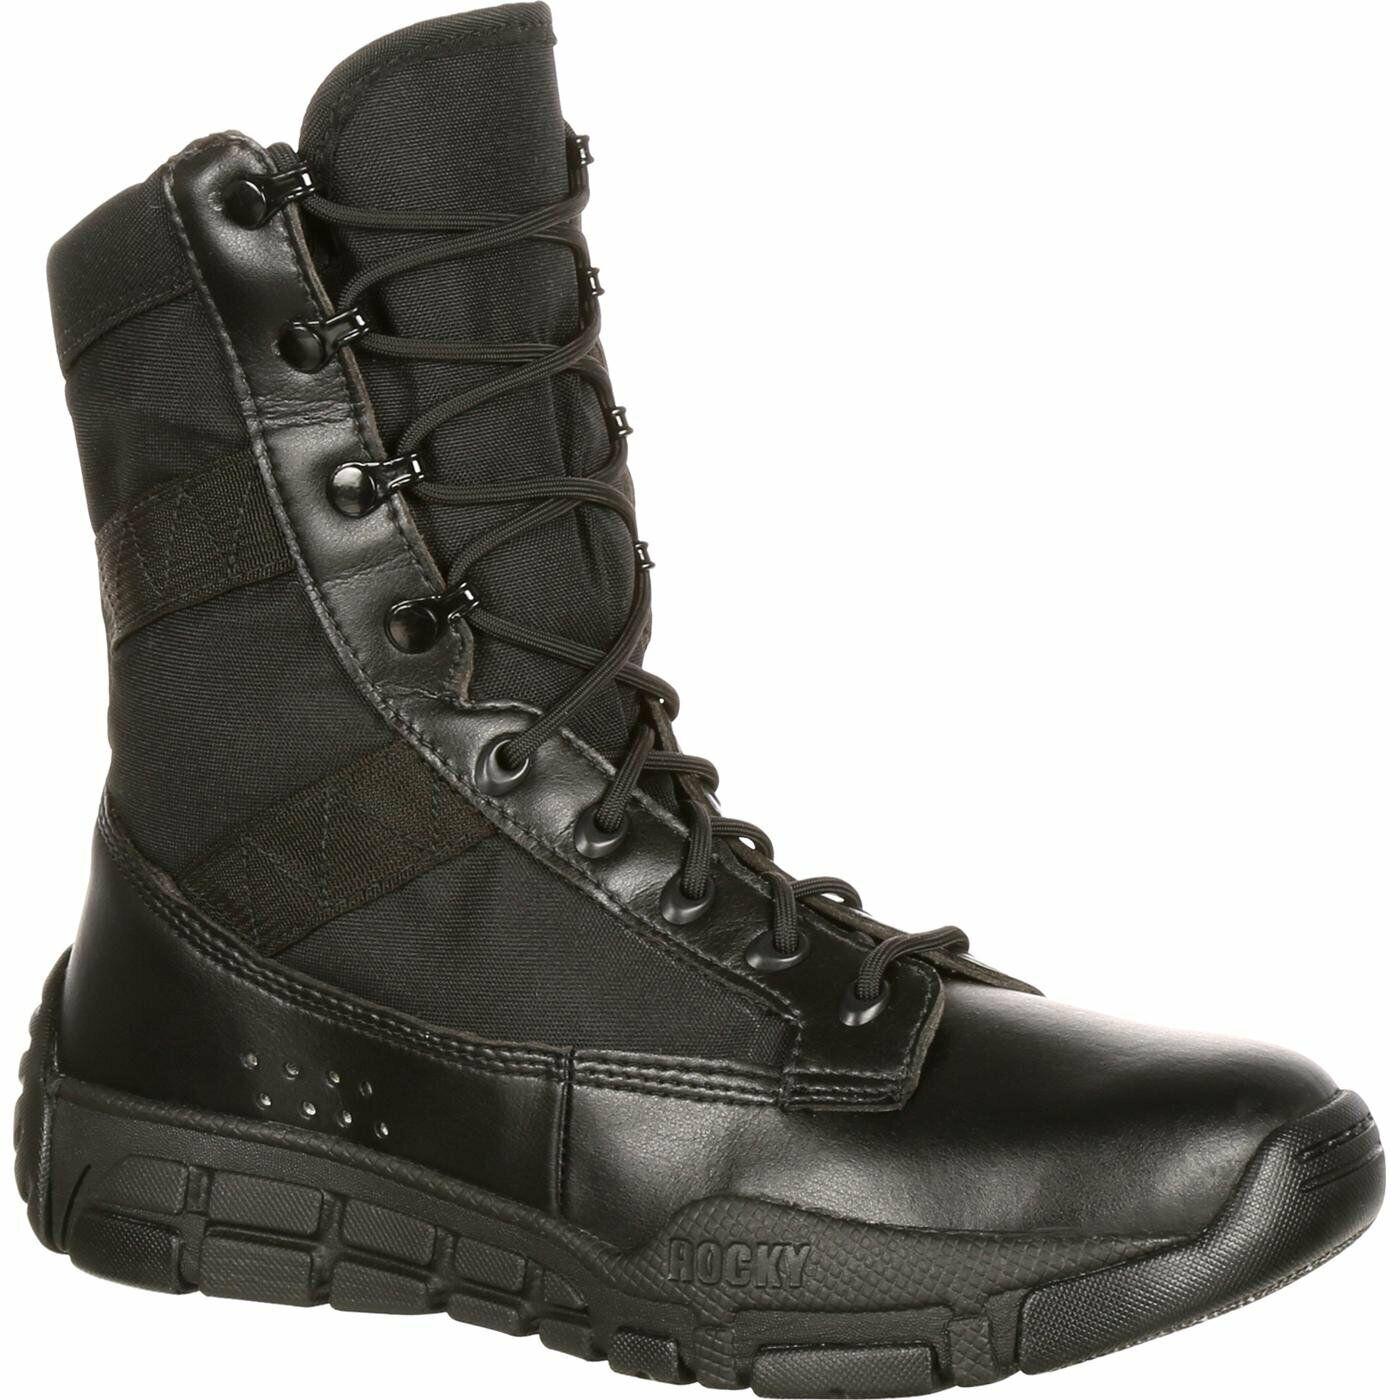 Rocky männer's C4T militär- Inspirot Duty Stiefel schwarz RY008